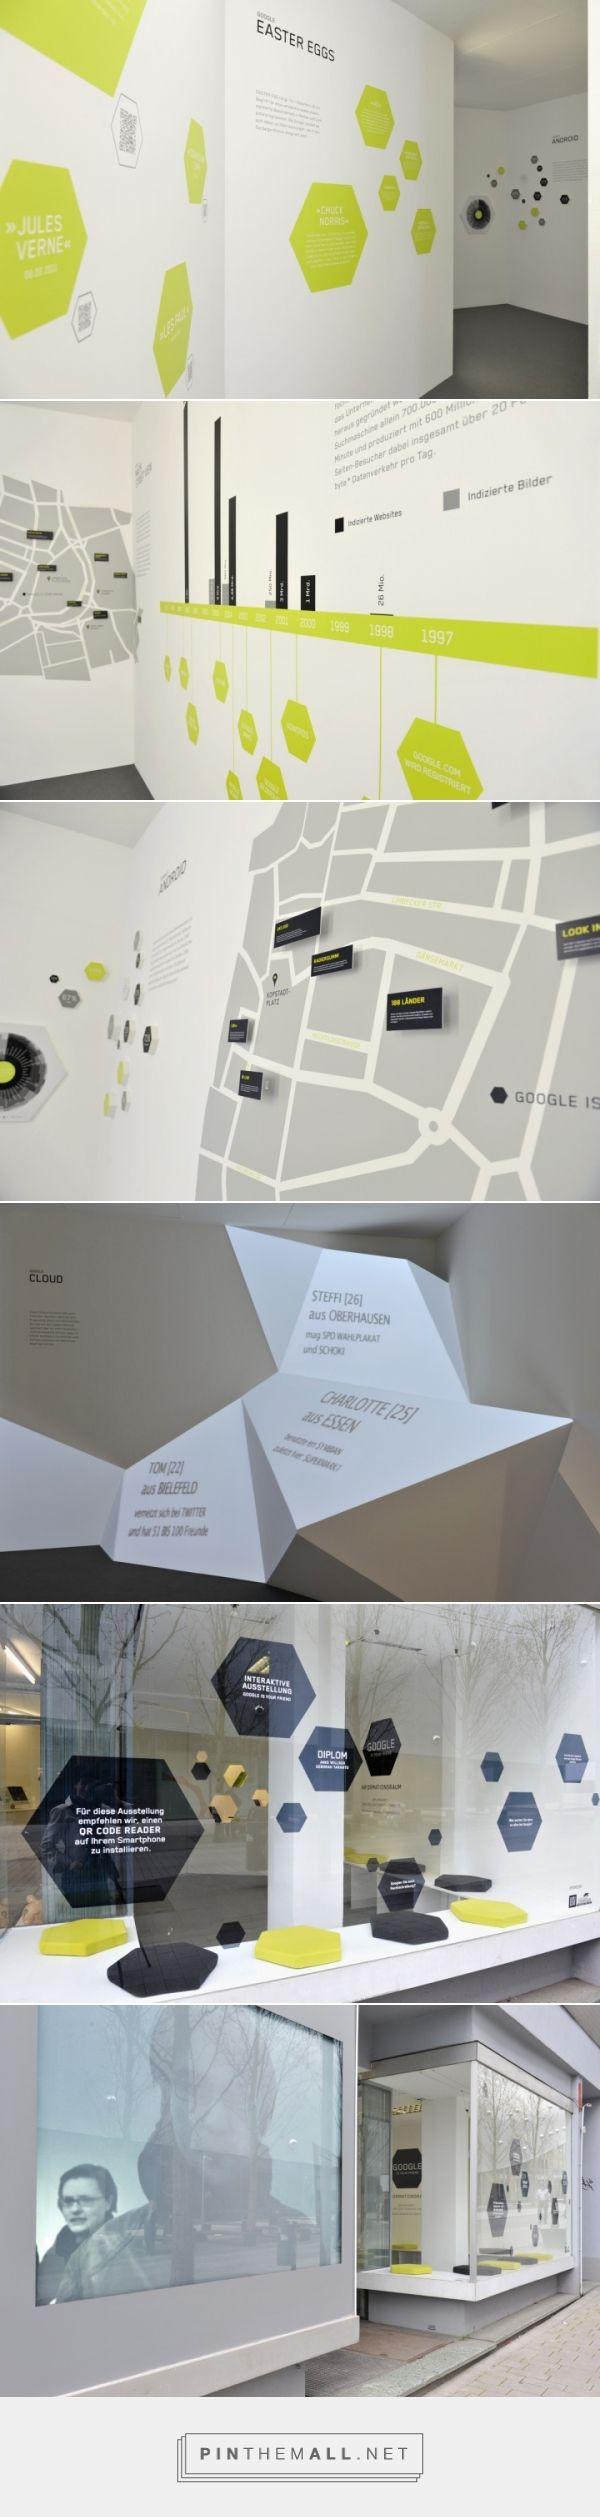 Google is your friend interactive exhibition by Anke Willsch & Deborah Taranto, Essen – Germany »  Retail Design Blog - created via http://pinthemall.net